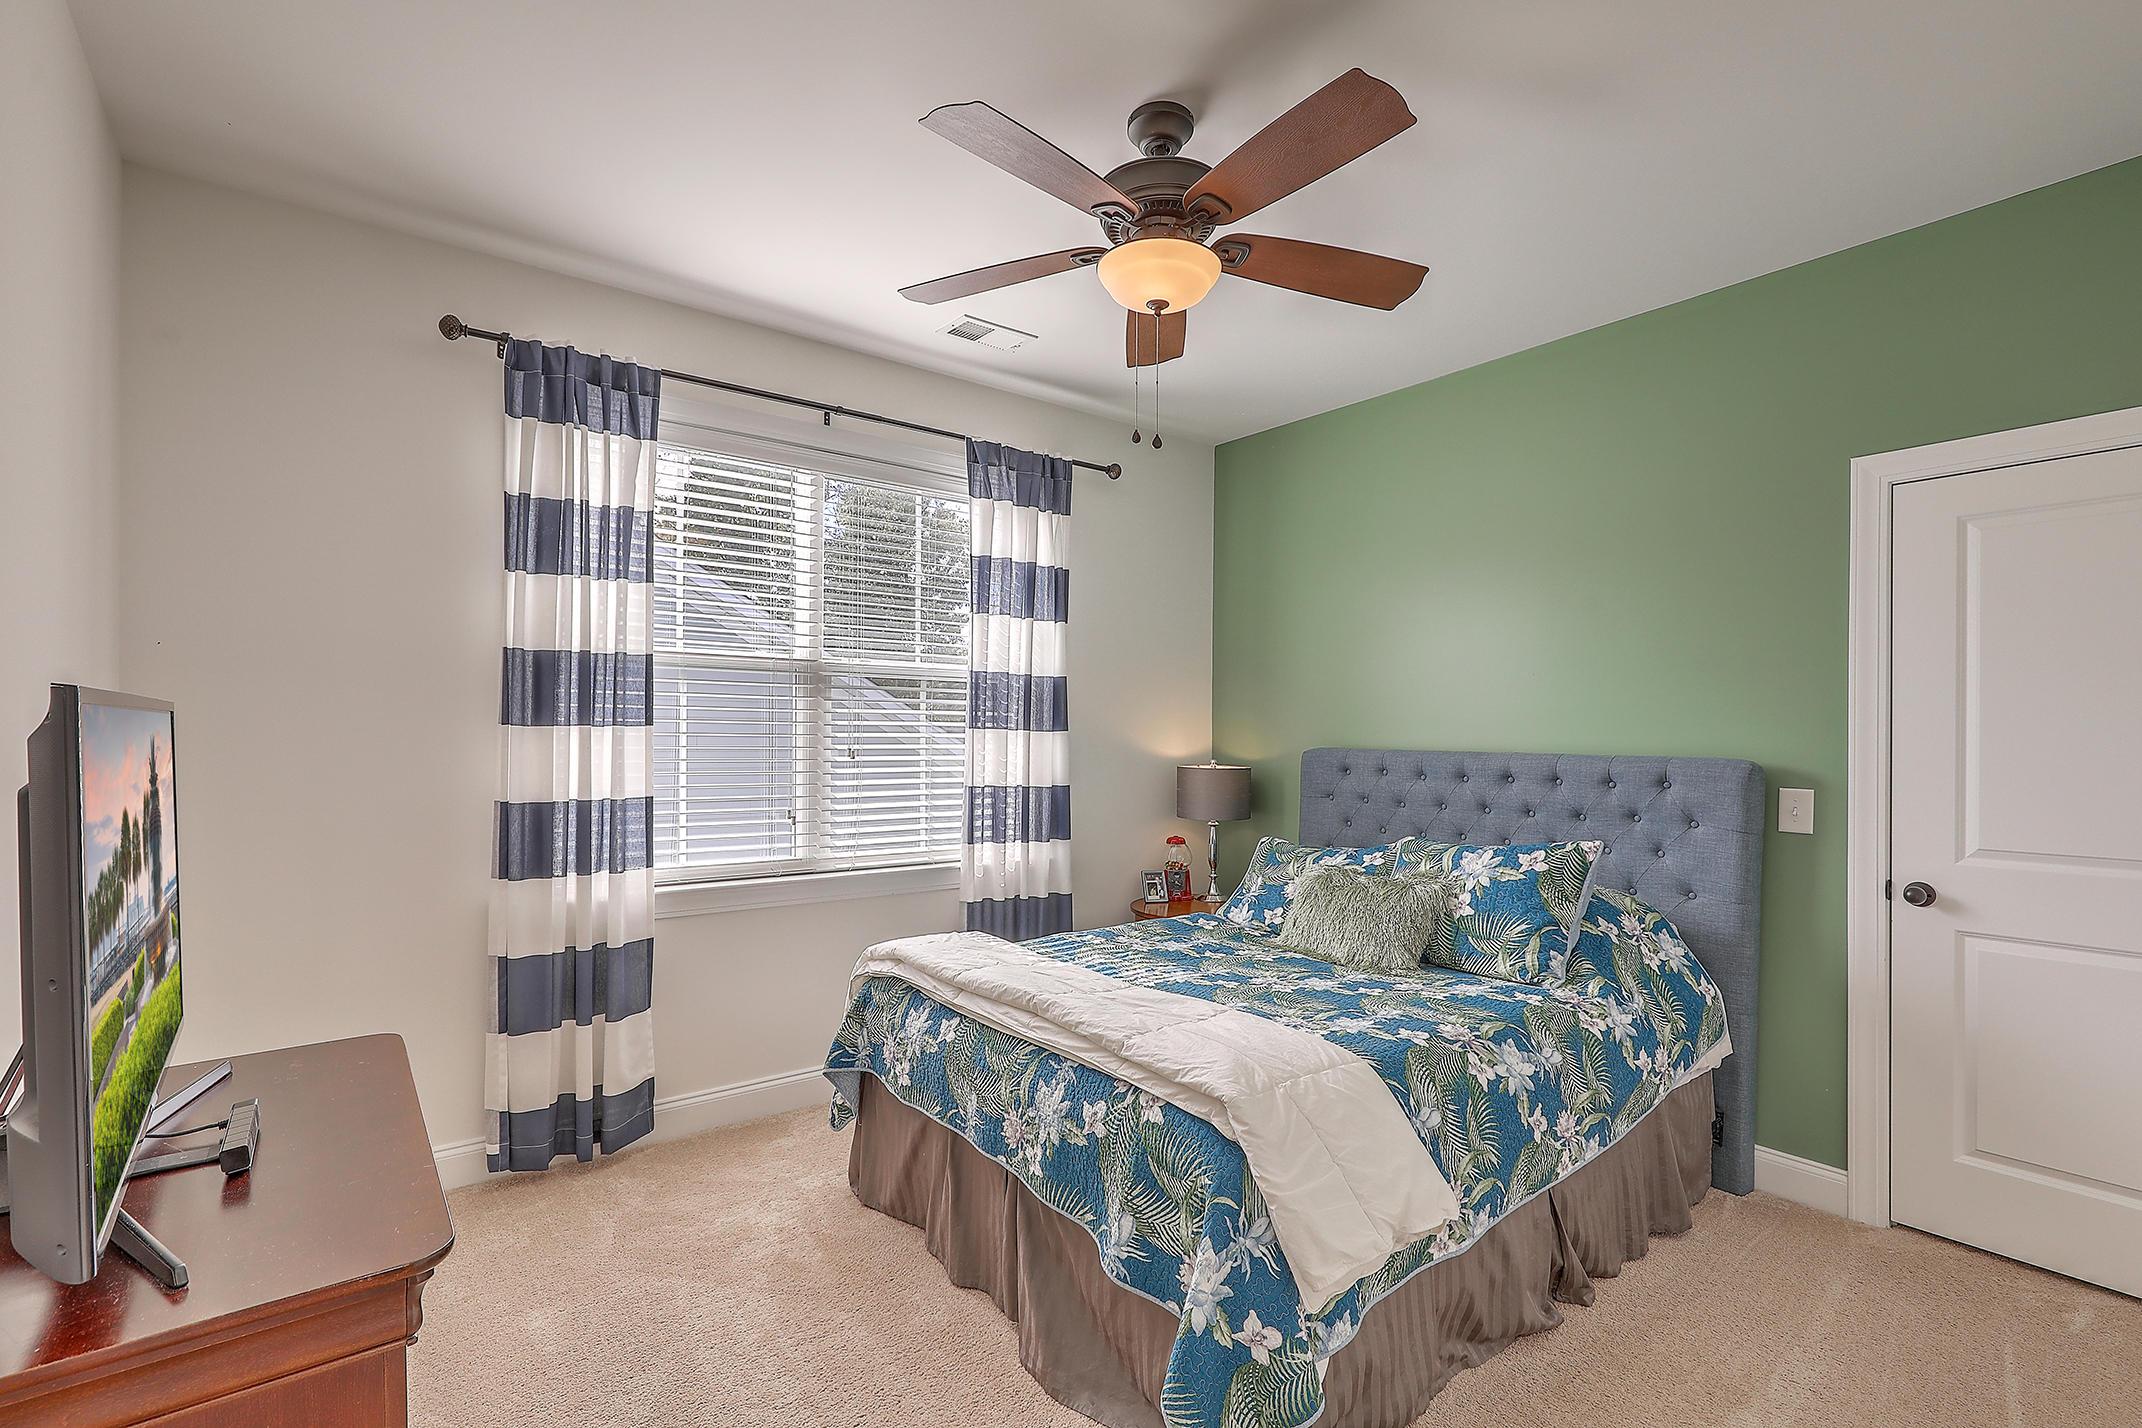 Park West Homes For Sale - 3412 Salterbeck, Mount Pleasant, SC - 19